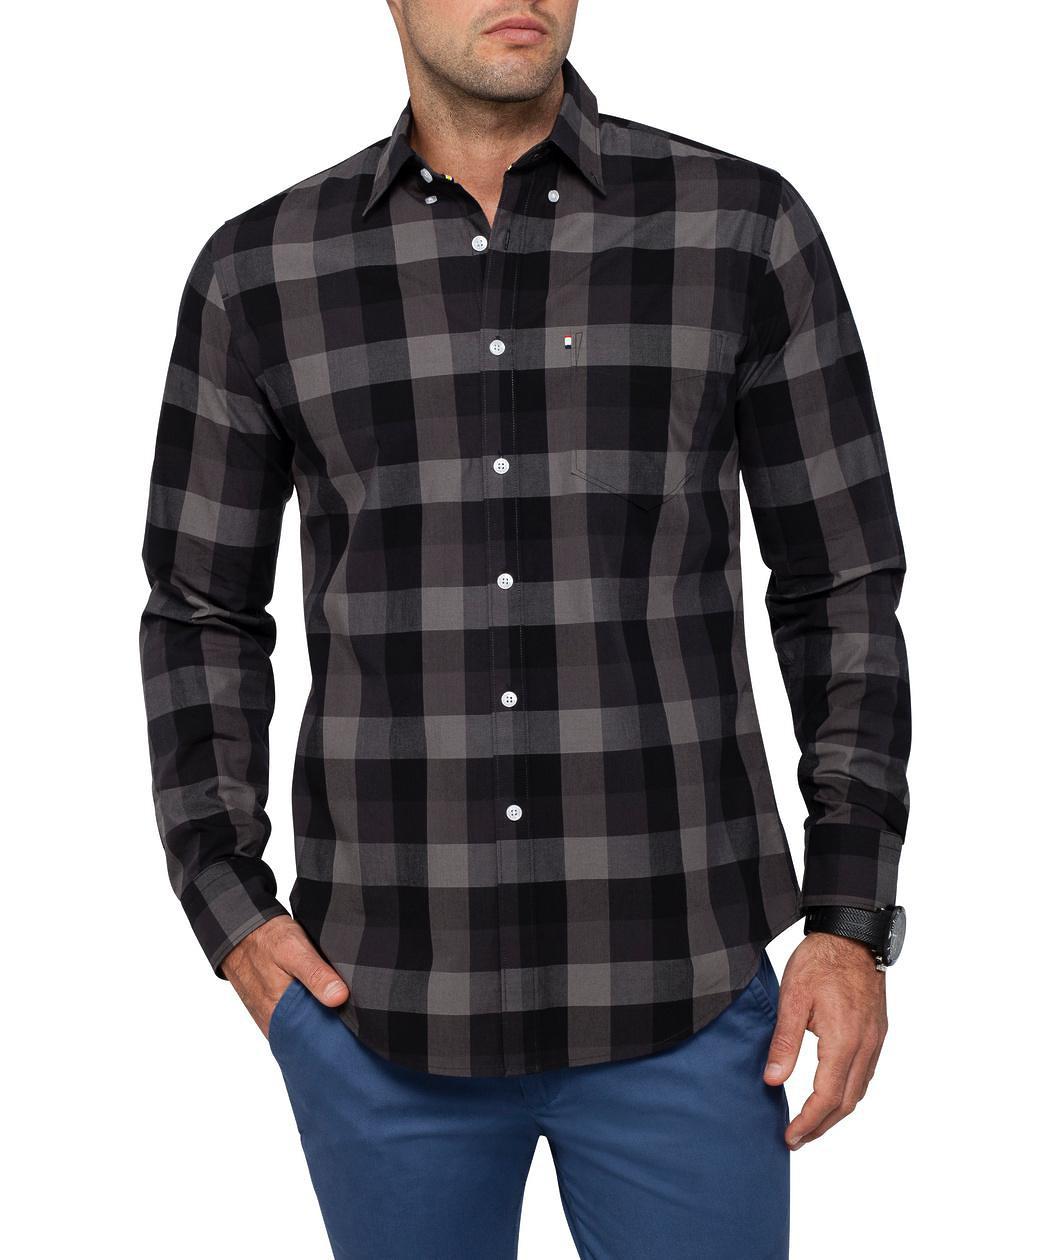 Van heusen casual black check shirt mens shirt van for Black and white check mens shirt